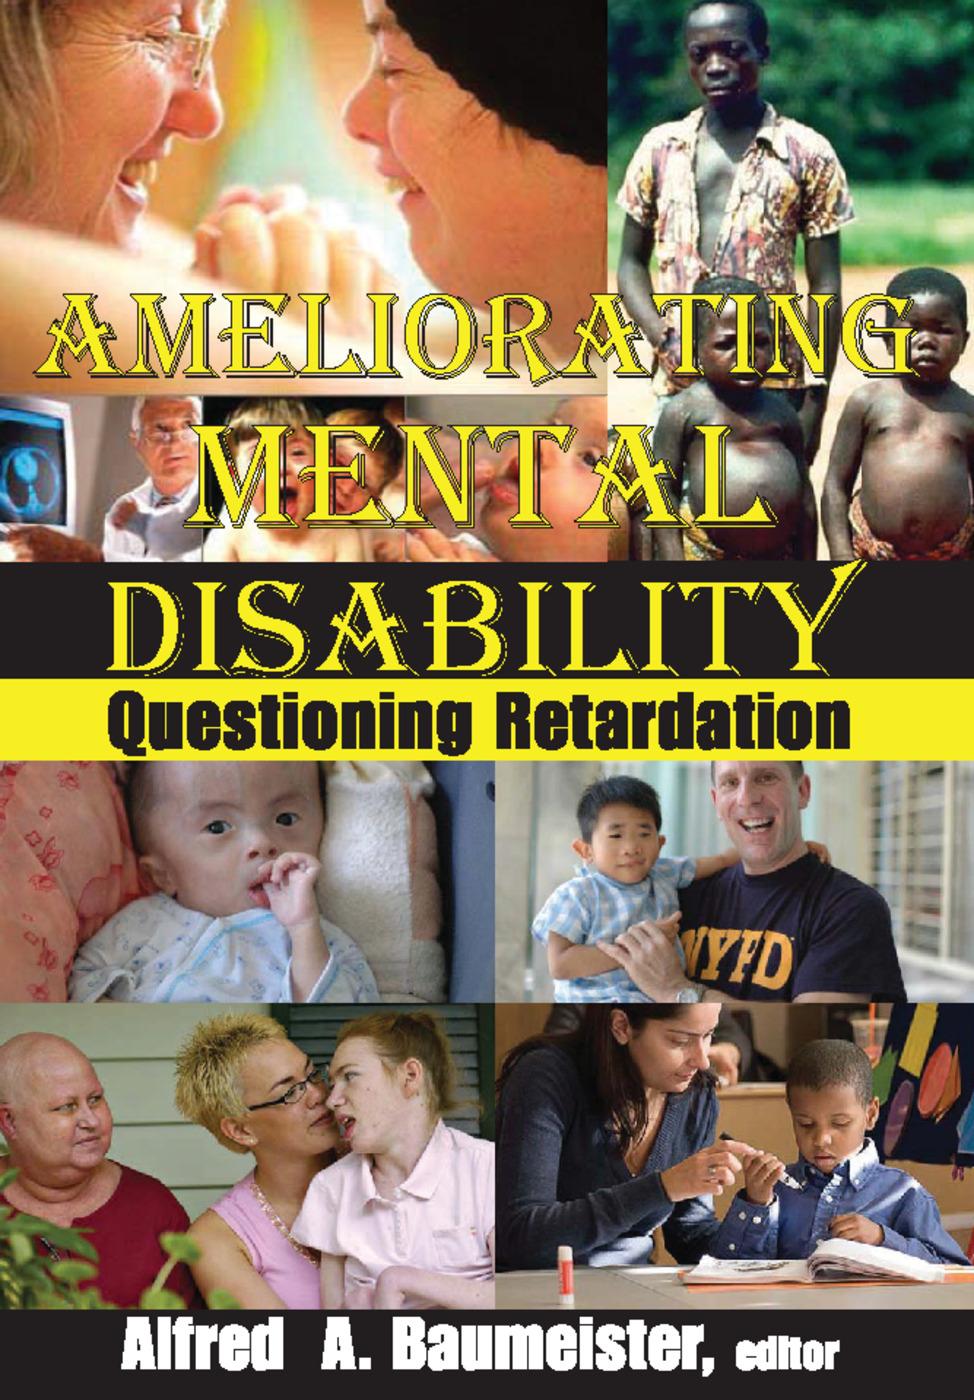 Ameliorating Mental Disability